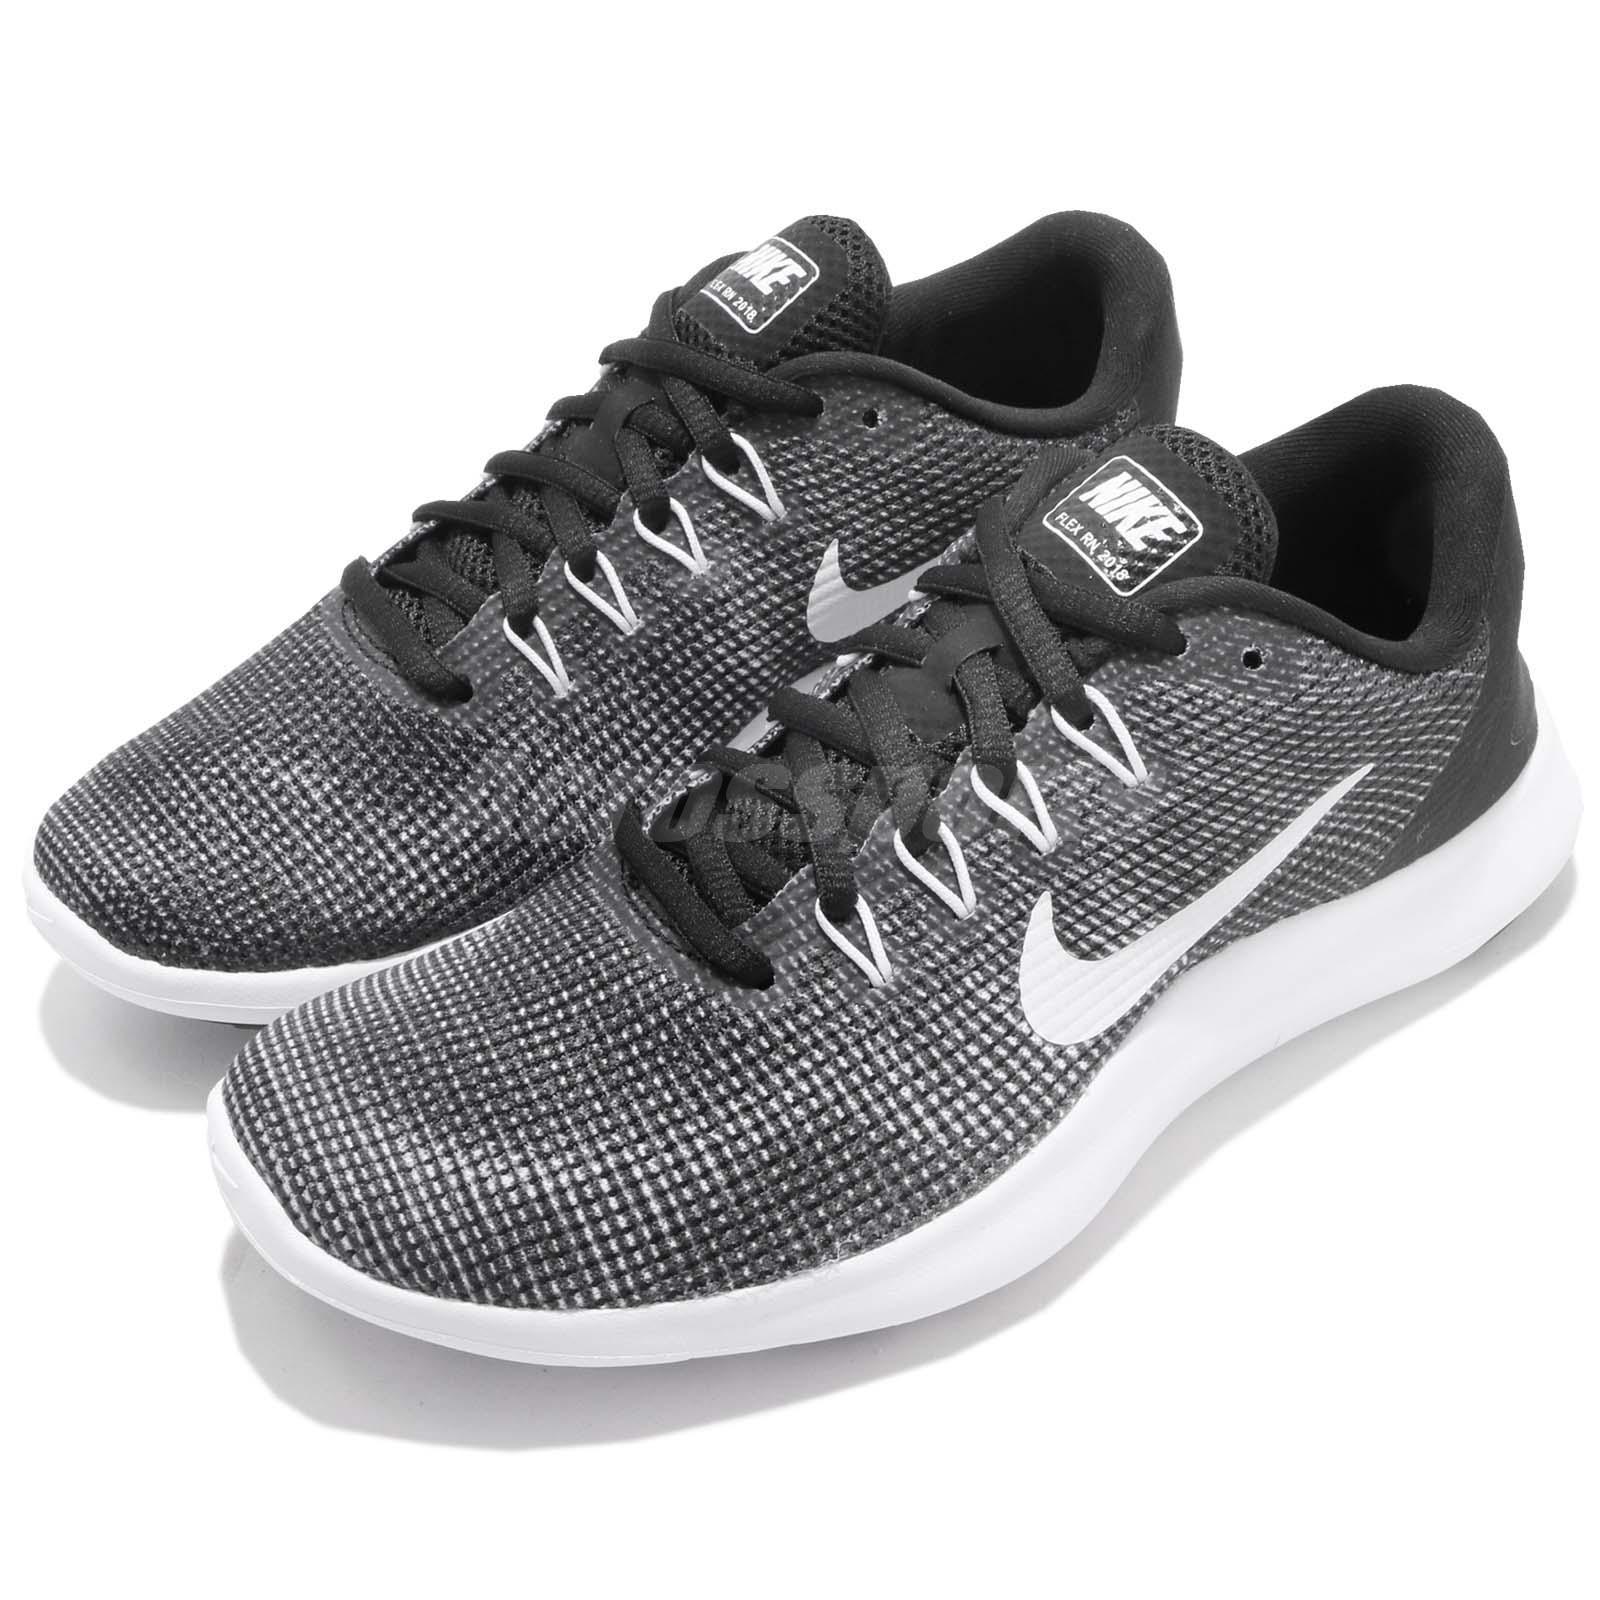 Nike Wmns Flex 2018 RN Black White Women Running Shoes Sneakers AA7408-001